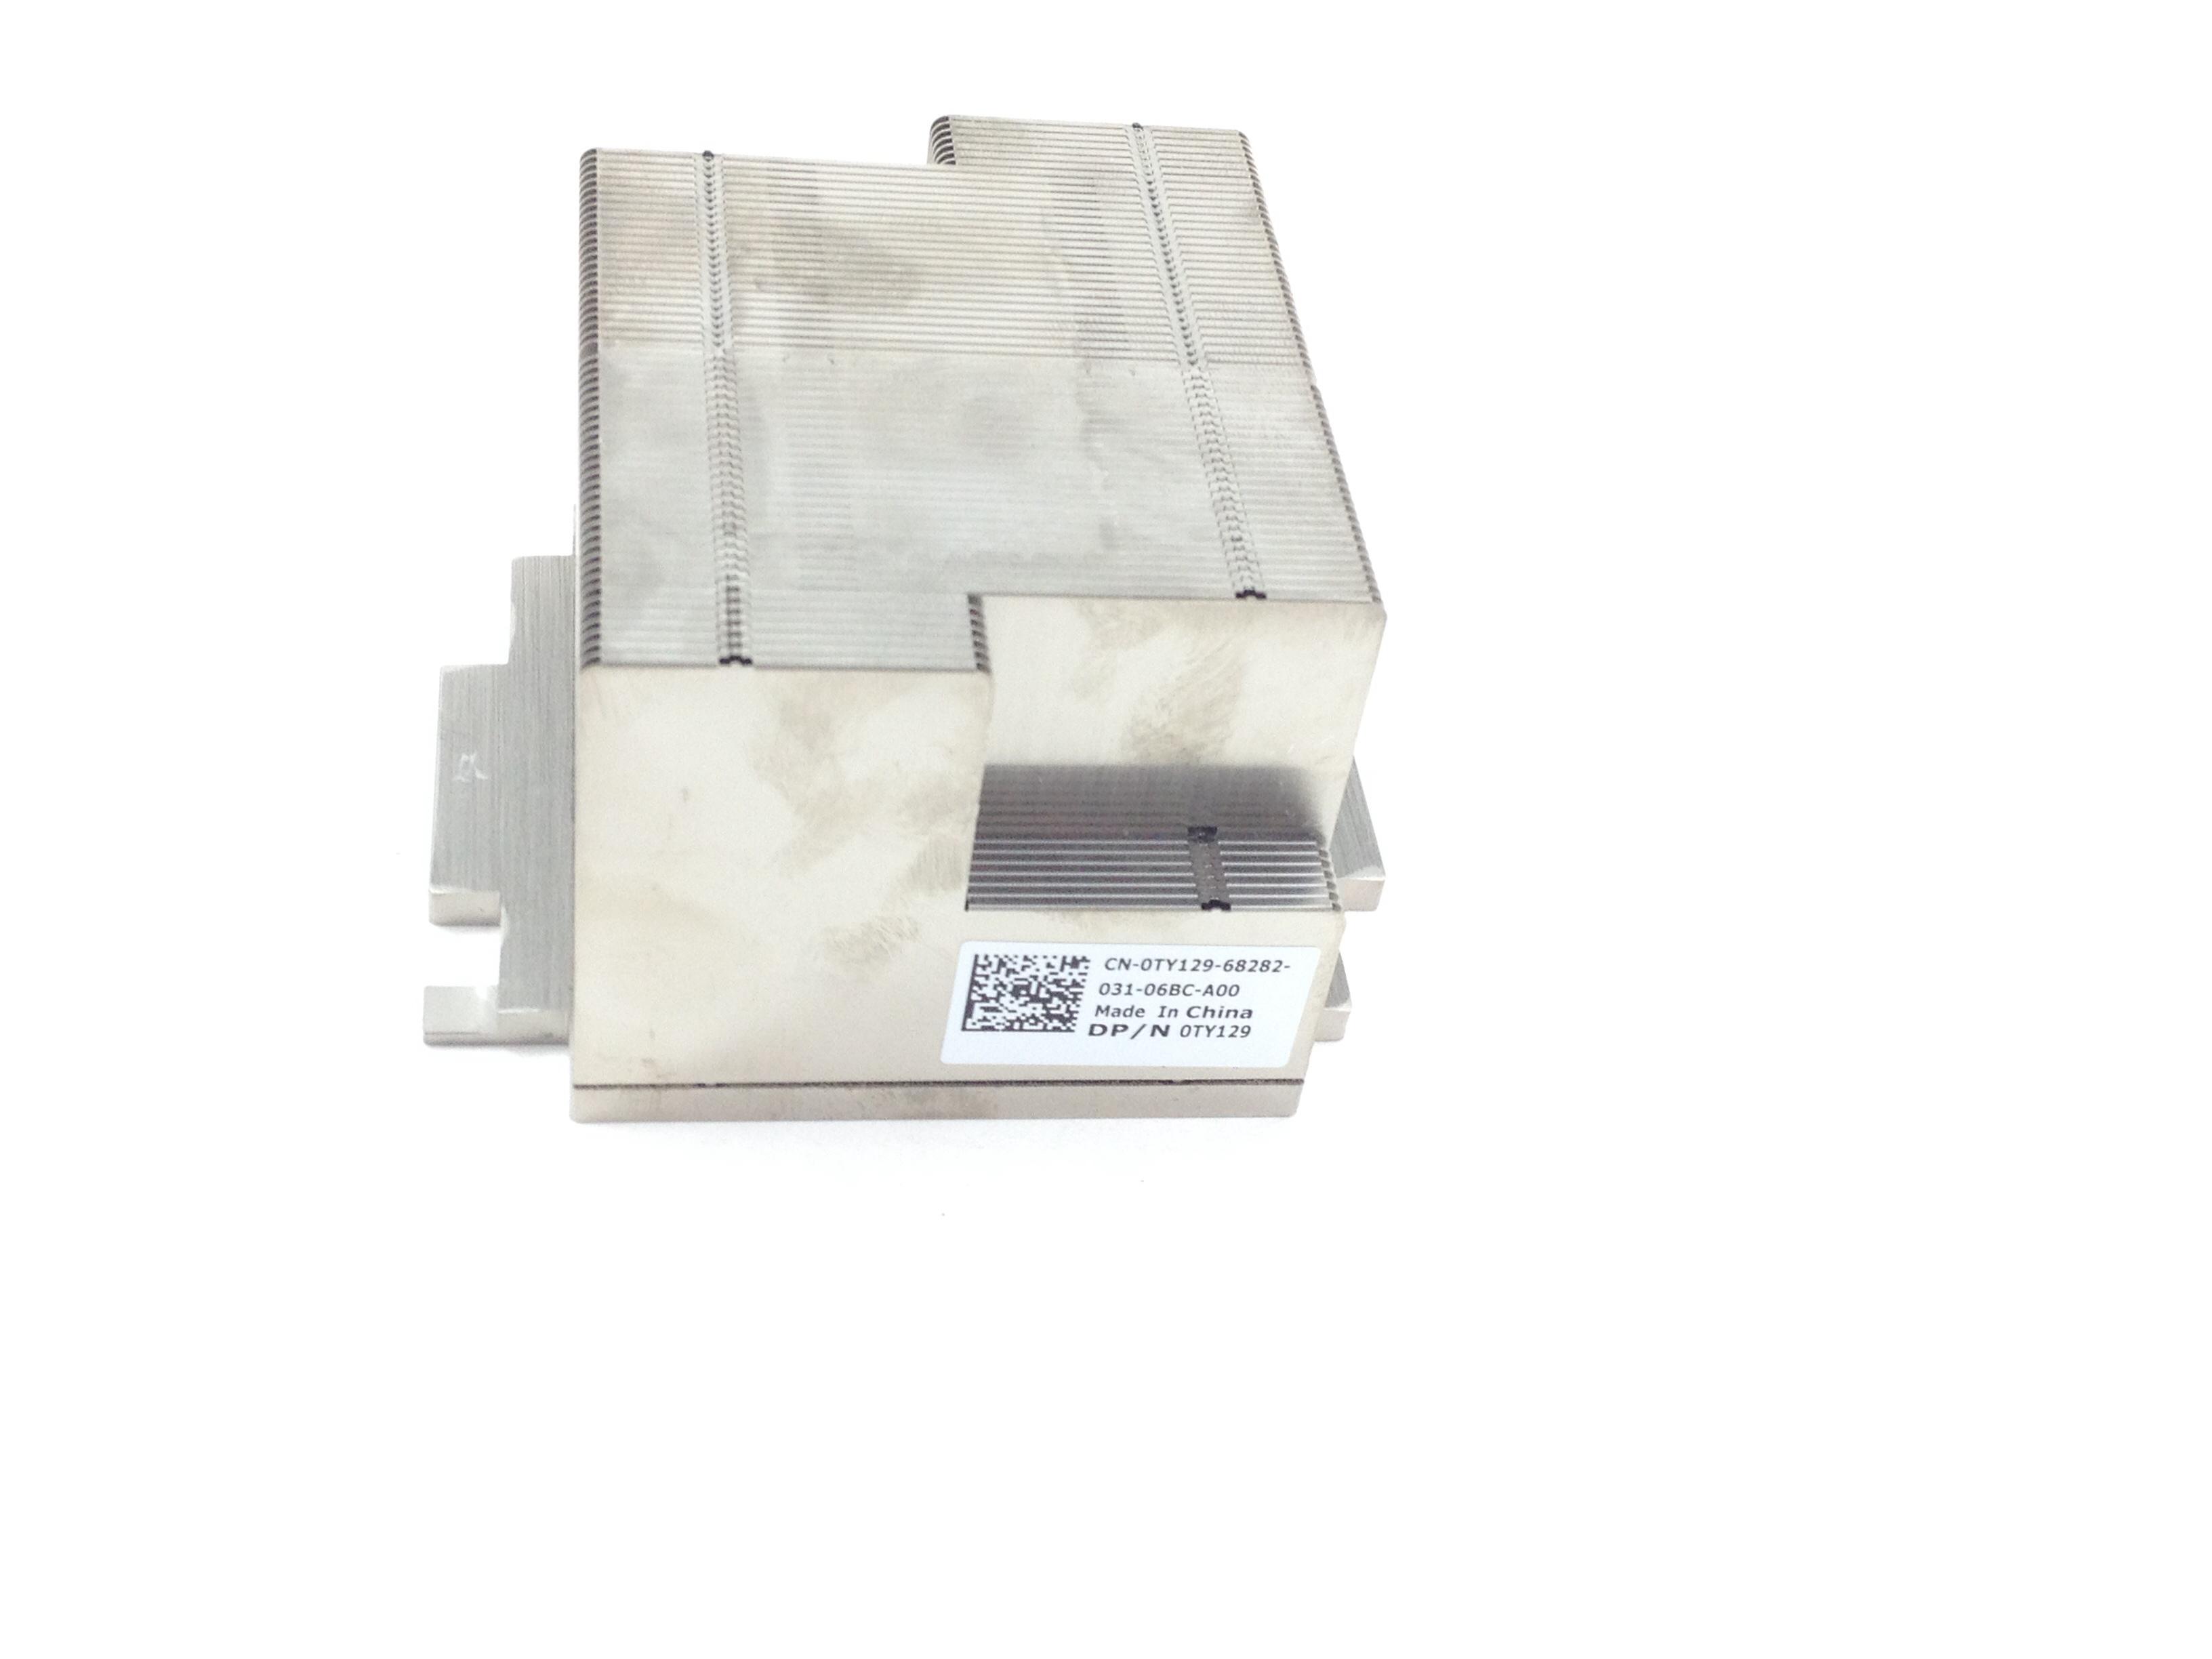 Dell PowerEdge R710 CPU Heatsink (TY129)